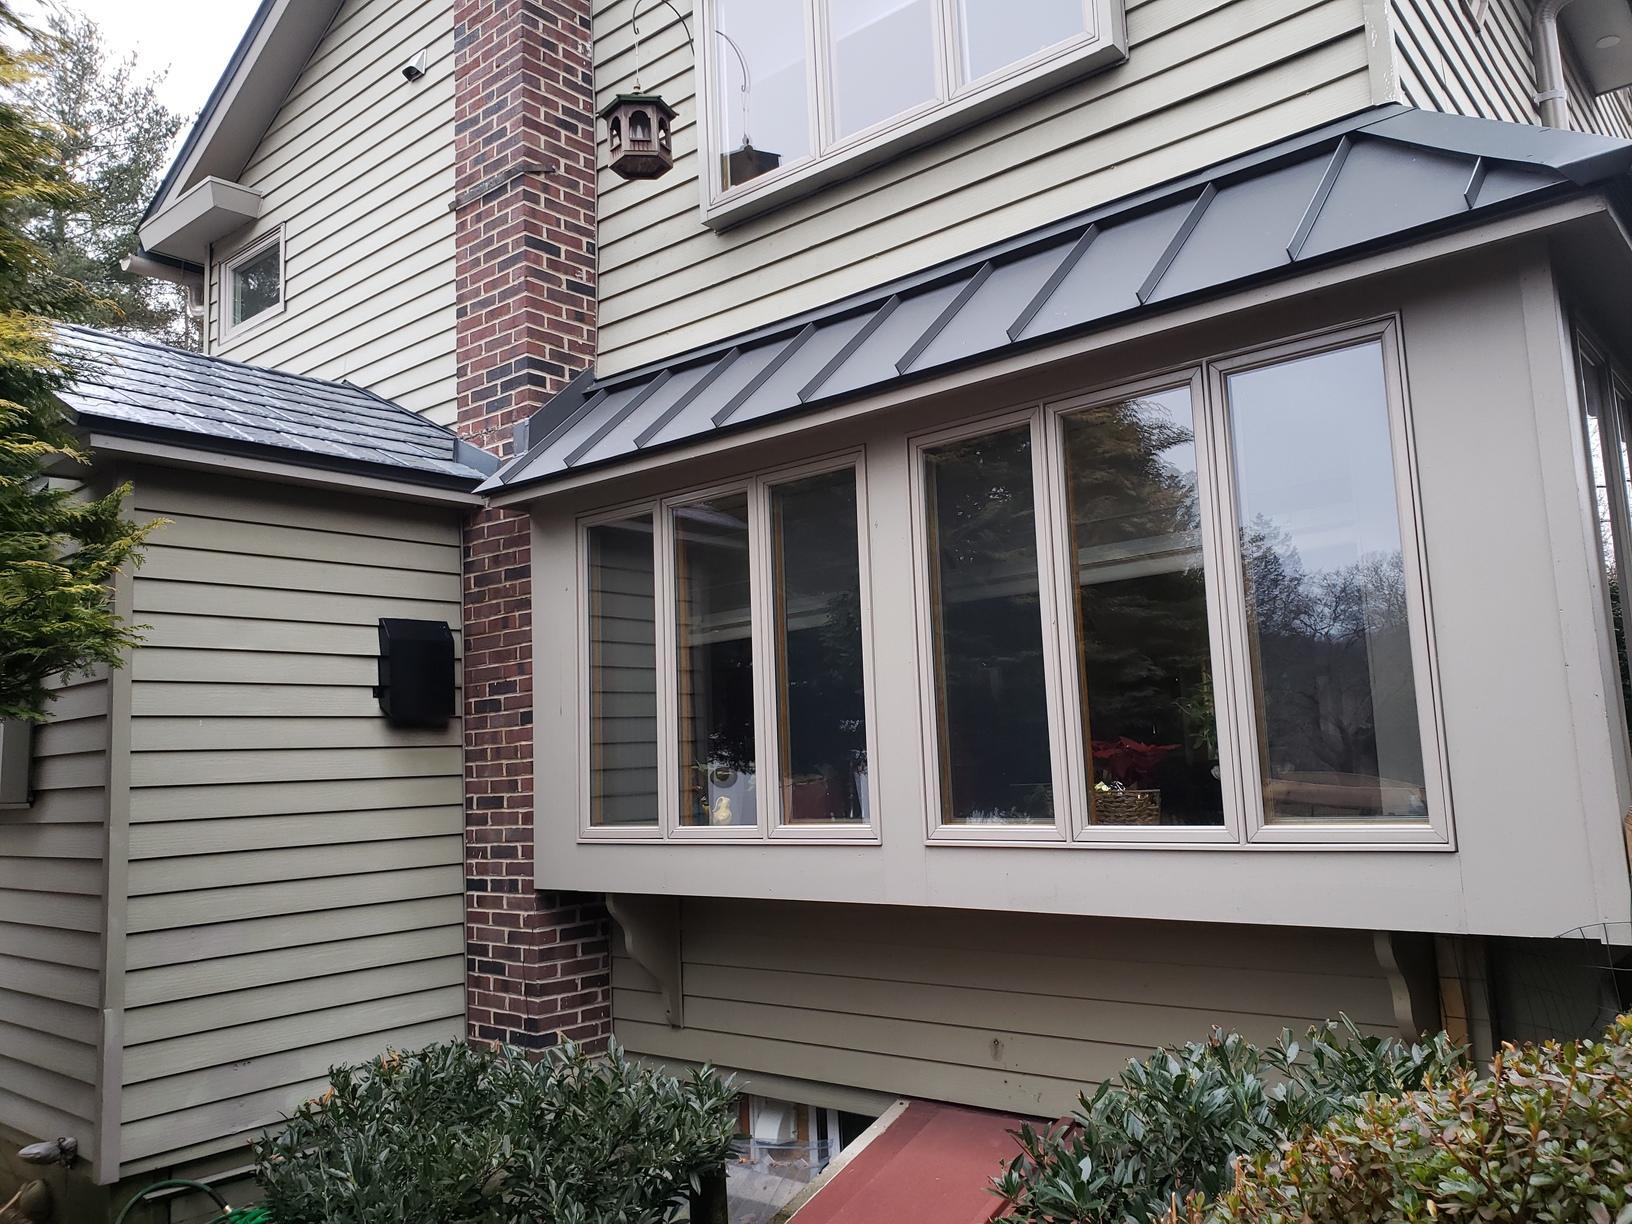 Standing Seam Metal Roof Over Windows